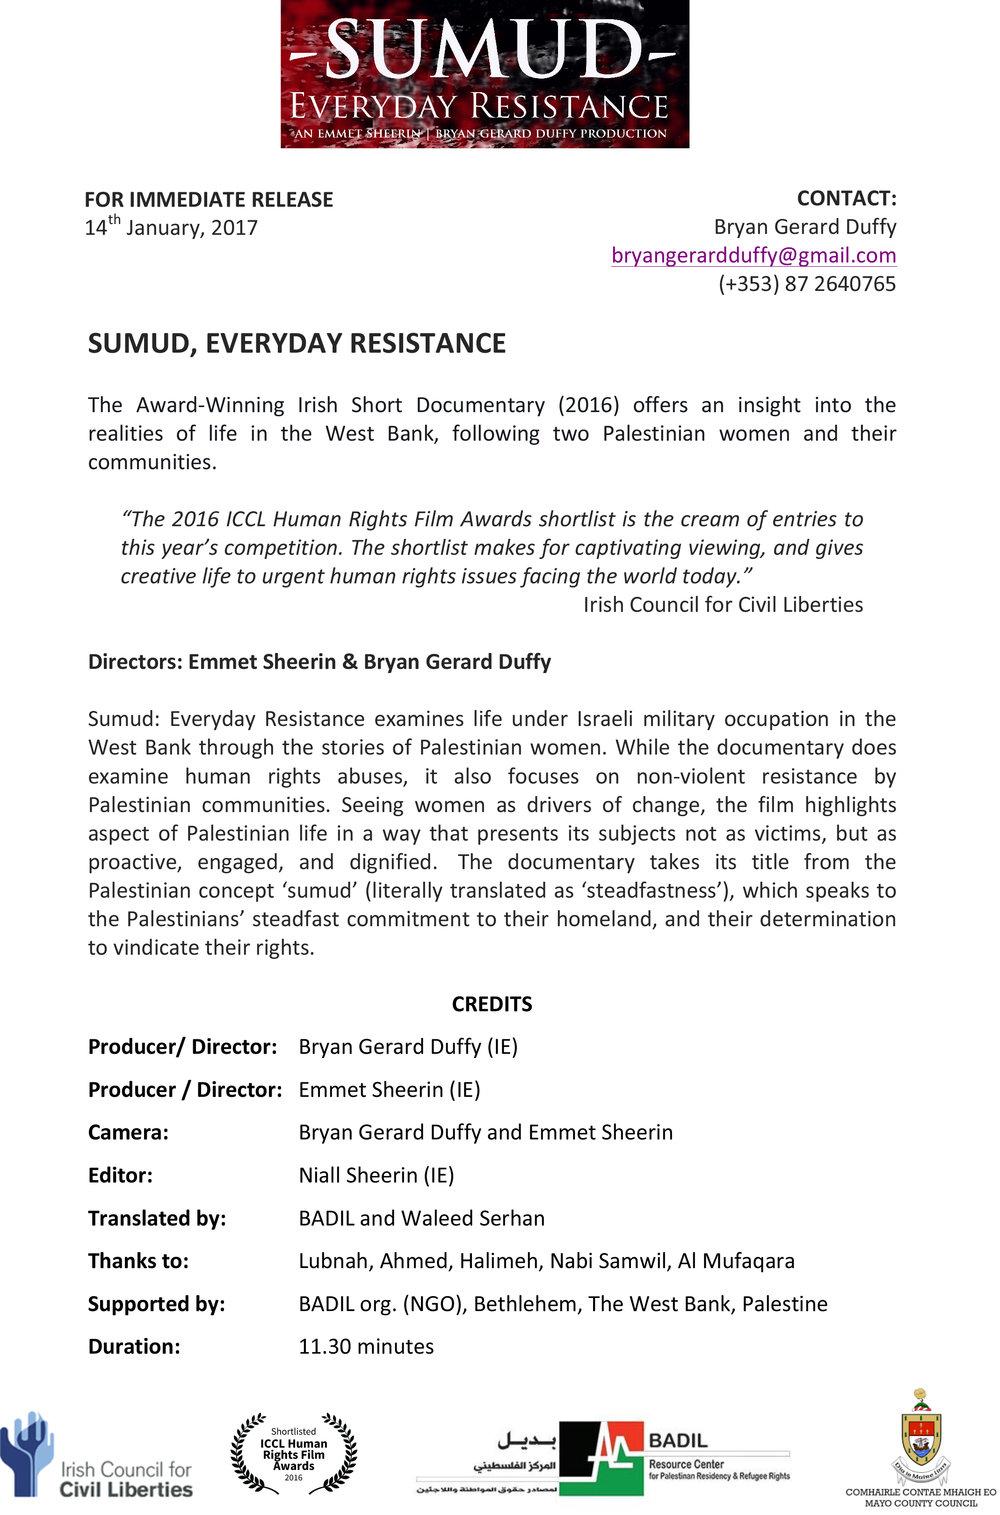 Sumud Press Release 2016